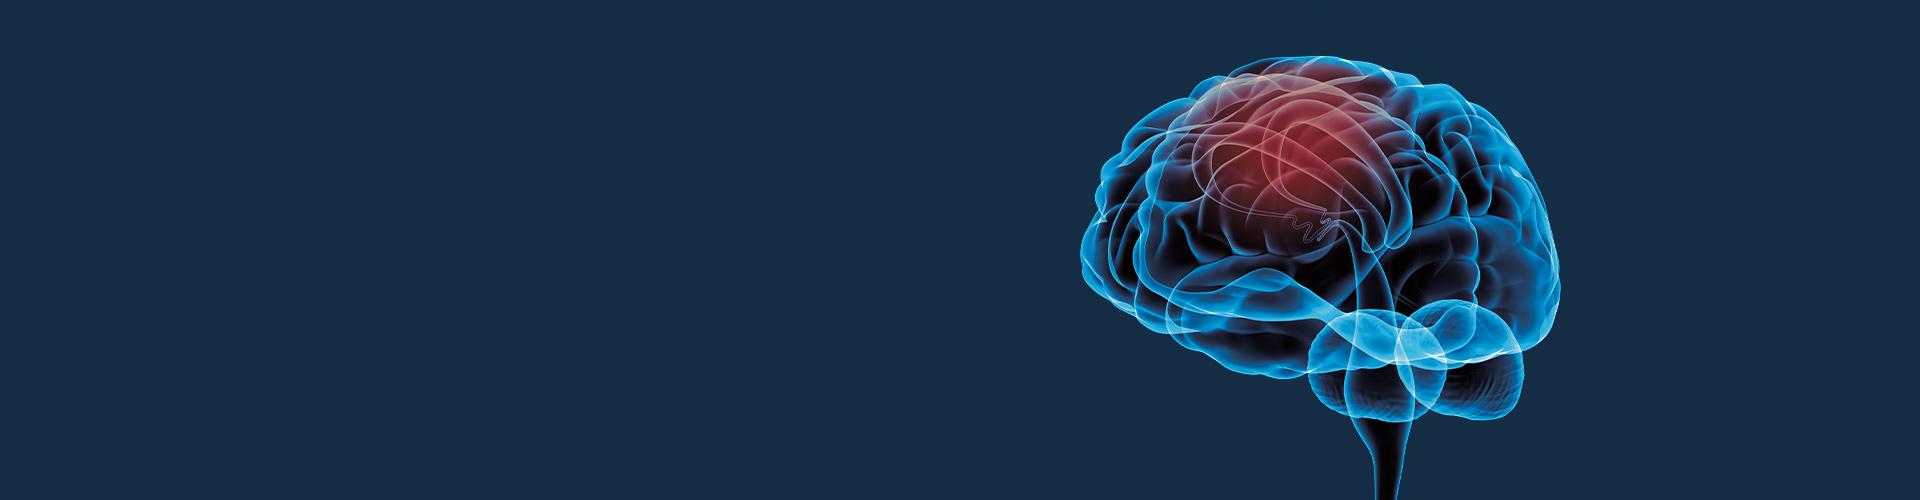 STIWELL Neurorehabilitation | Anwendungen in der Neurologie